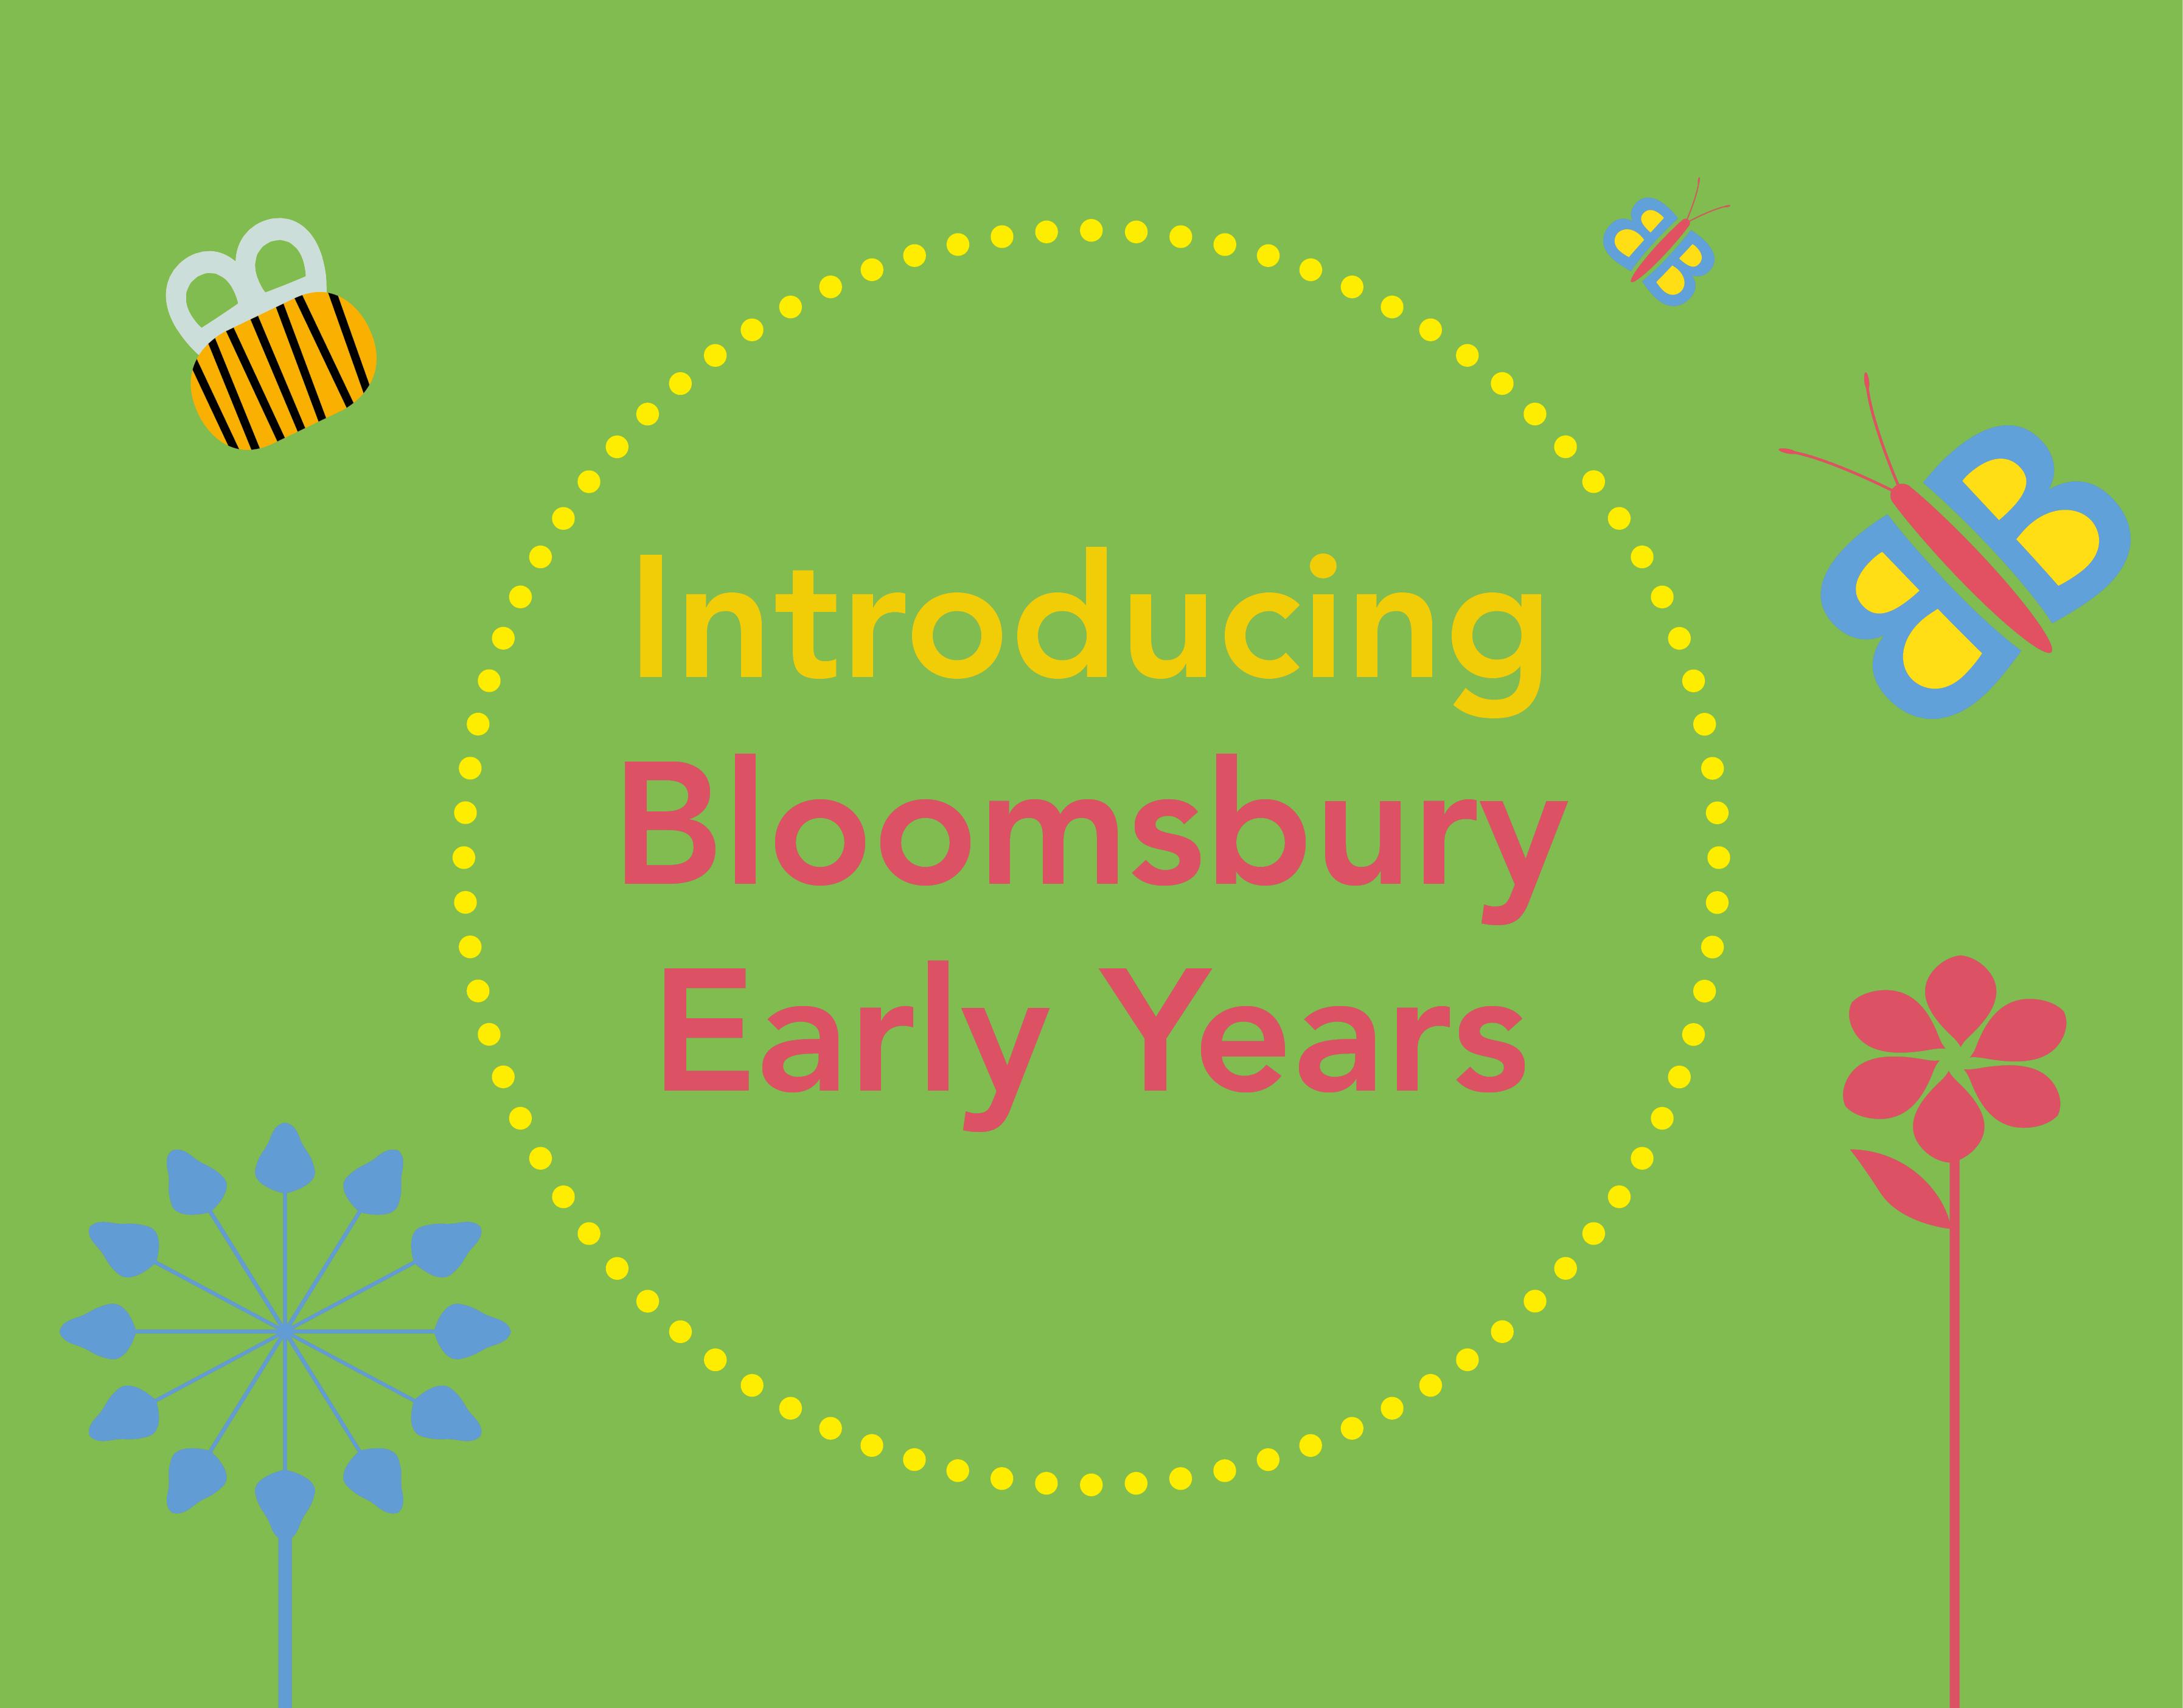 Introducing Bloomsbury Early Years